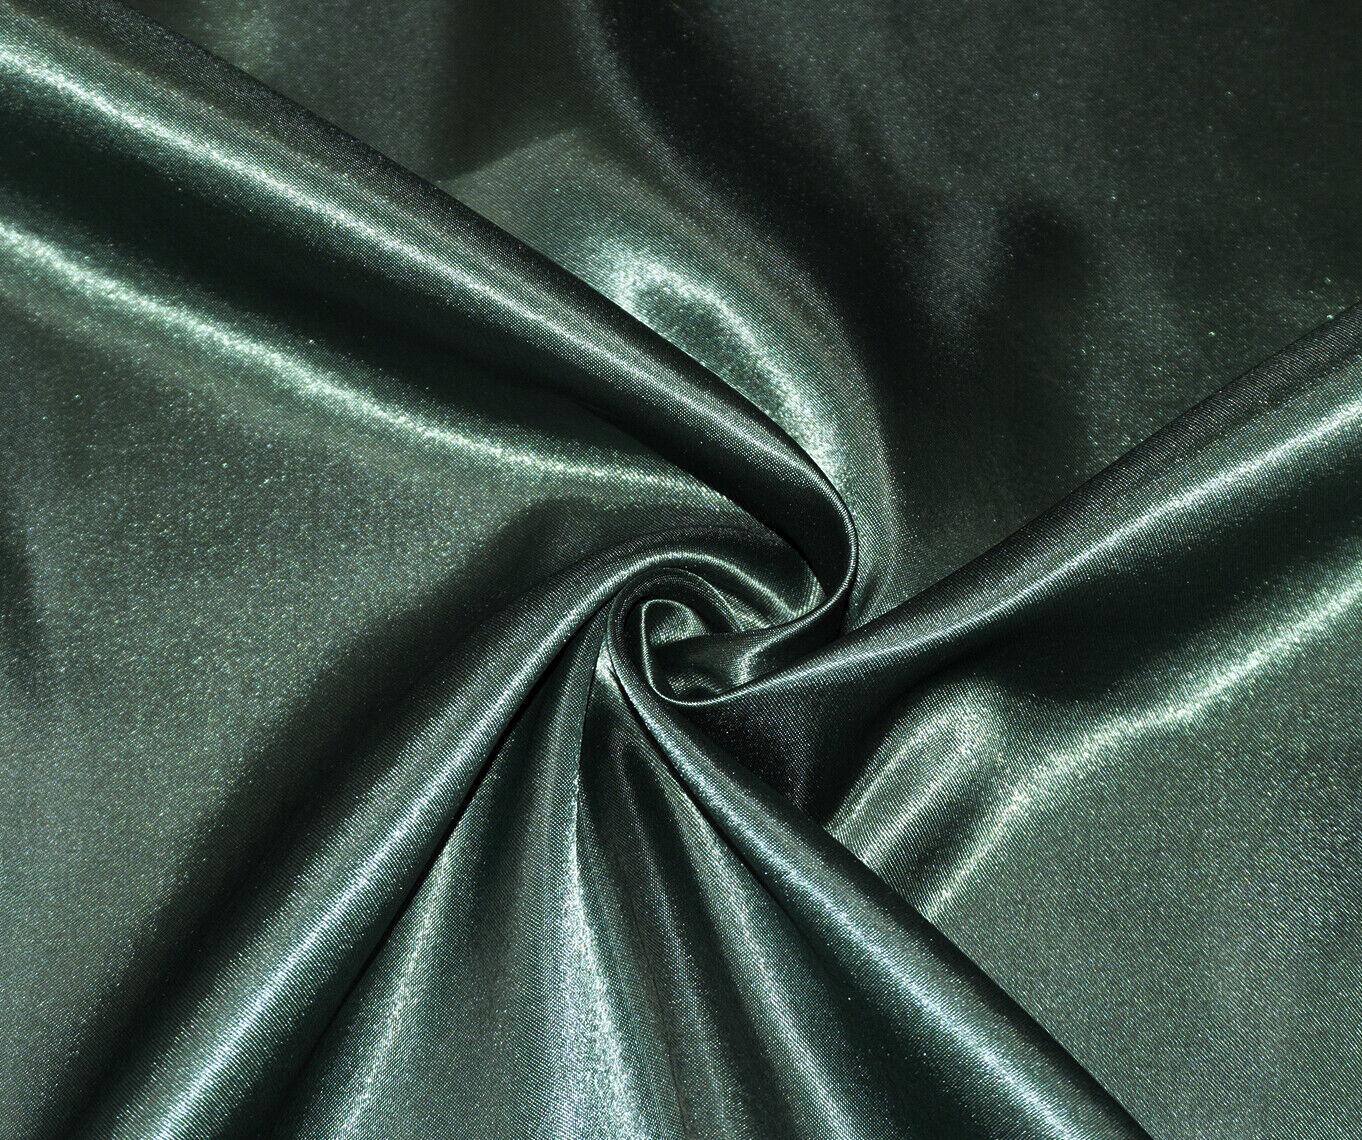 Light Pink Silky Satin Dress Craft Fabric Wedding Material 150cm Wide